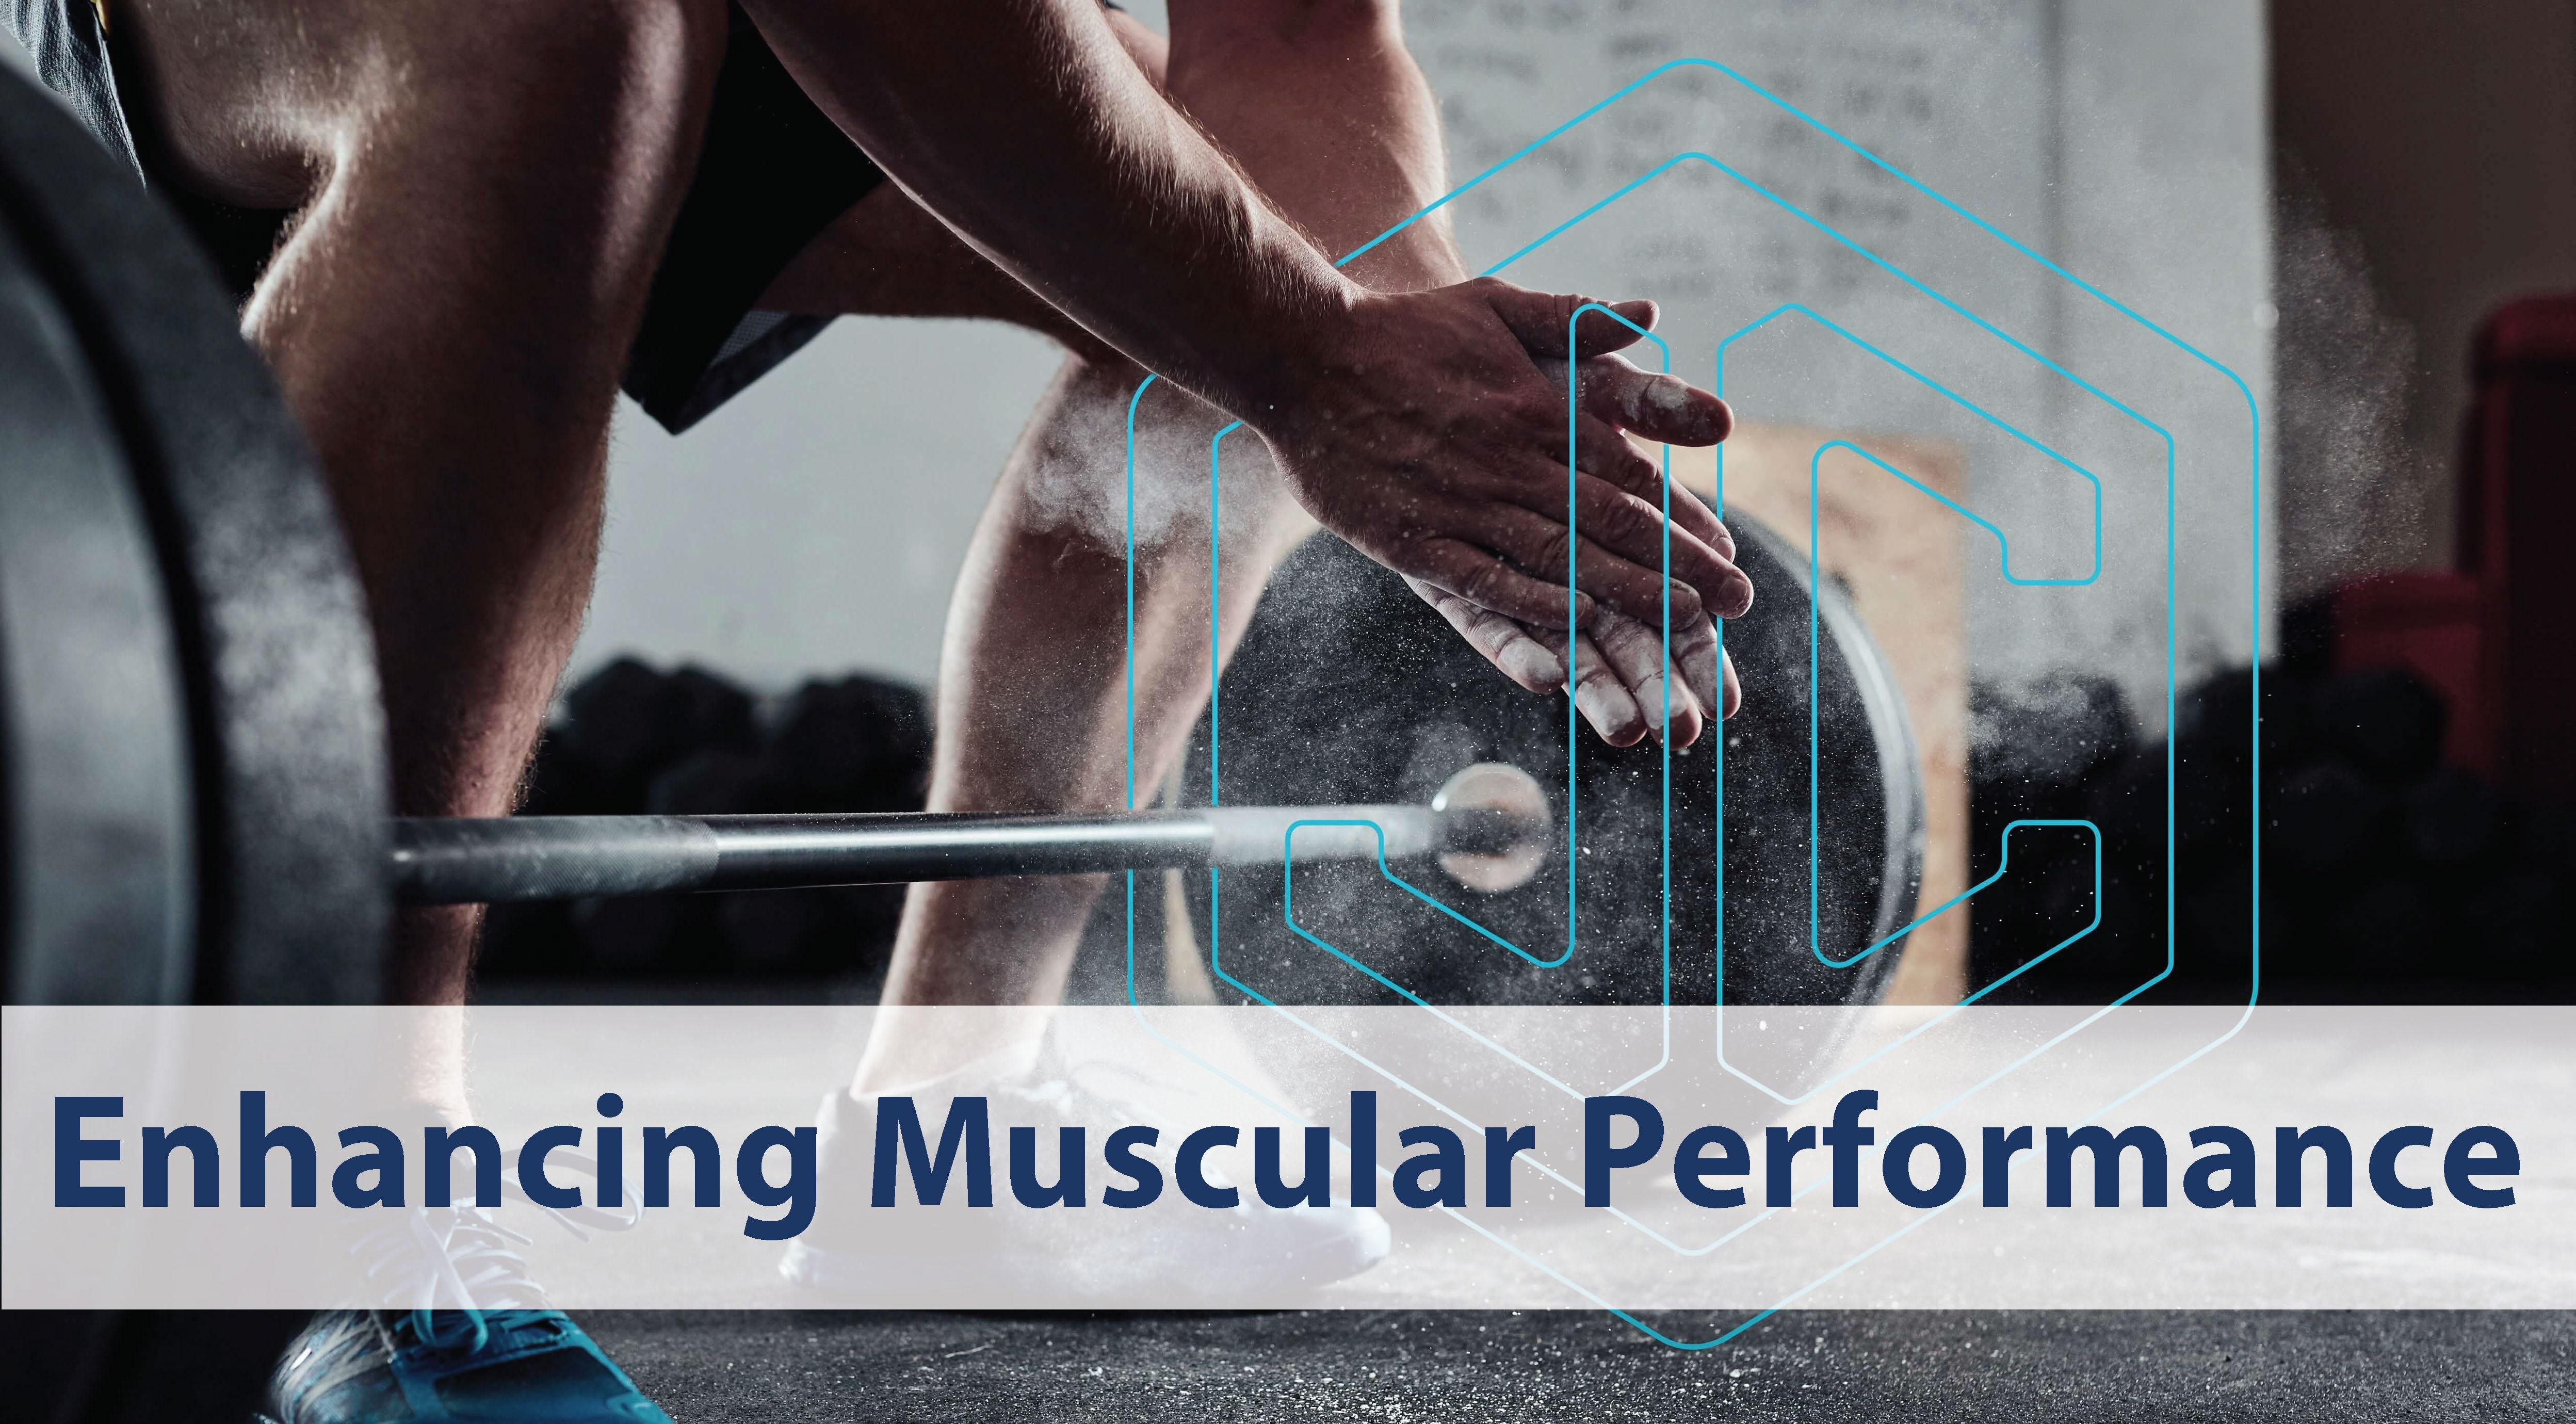 Enhancing Muscular Performance